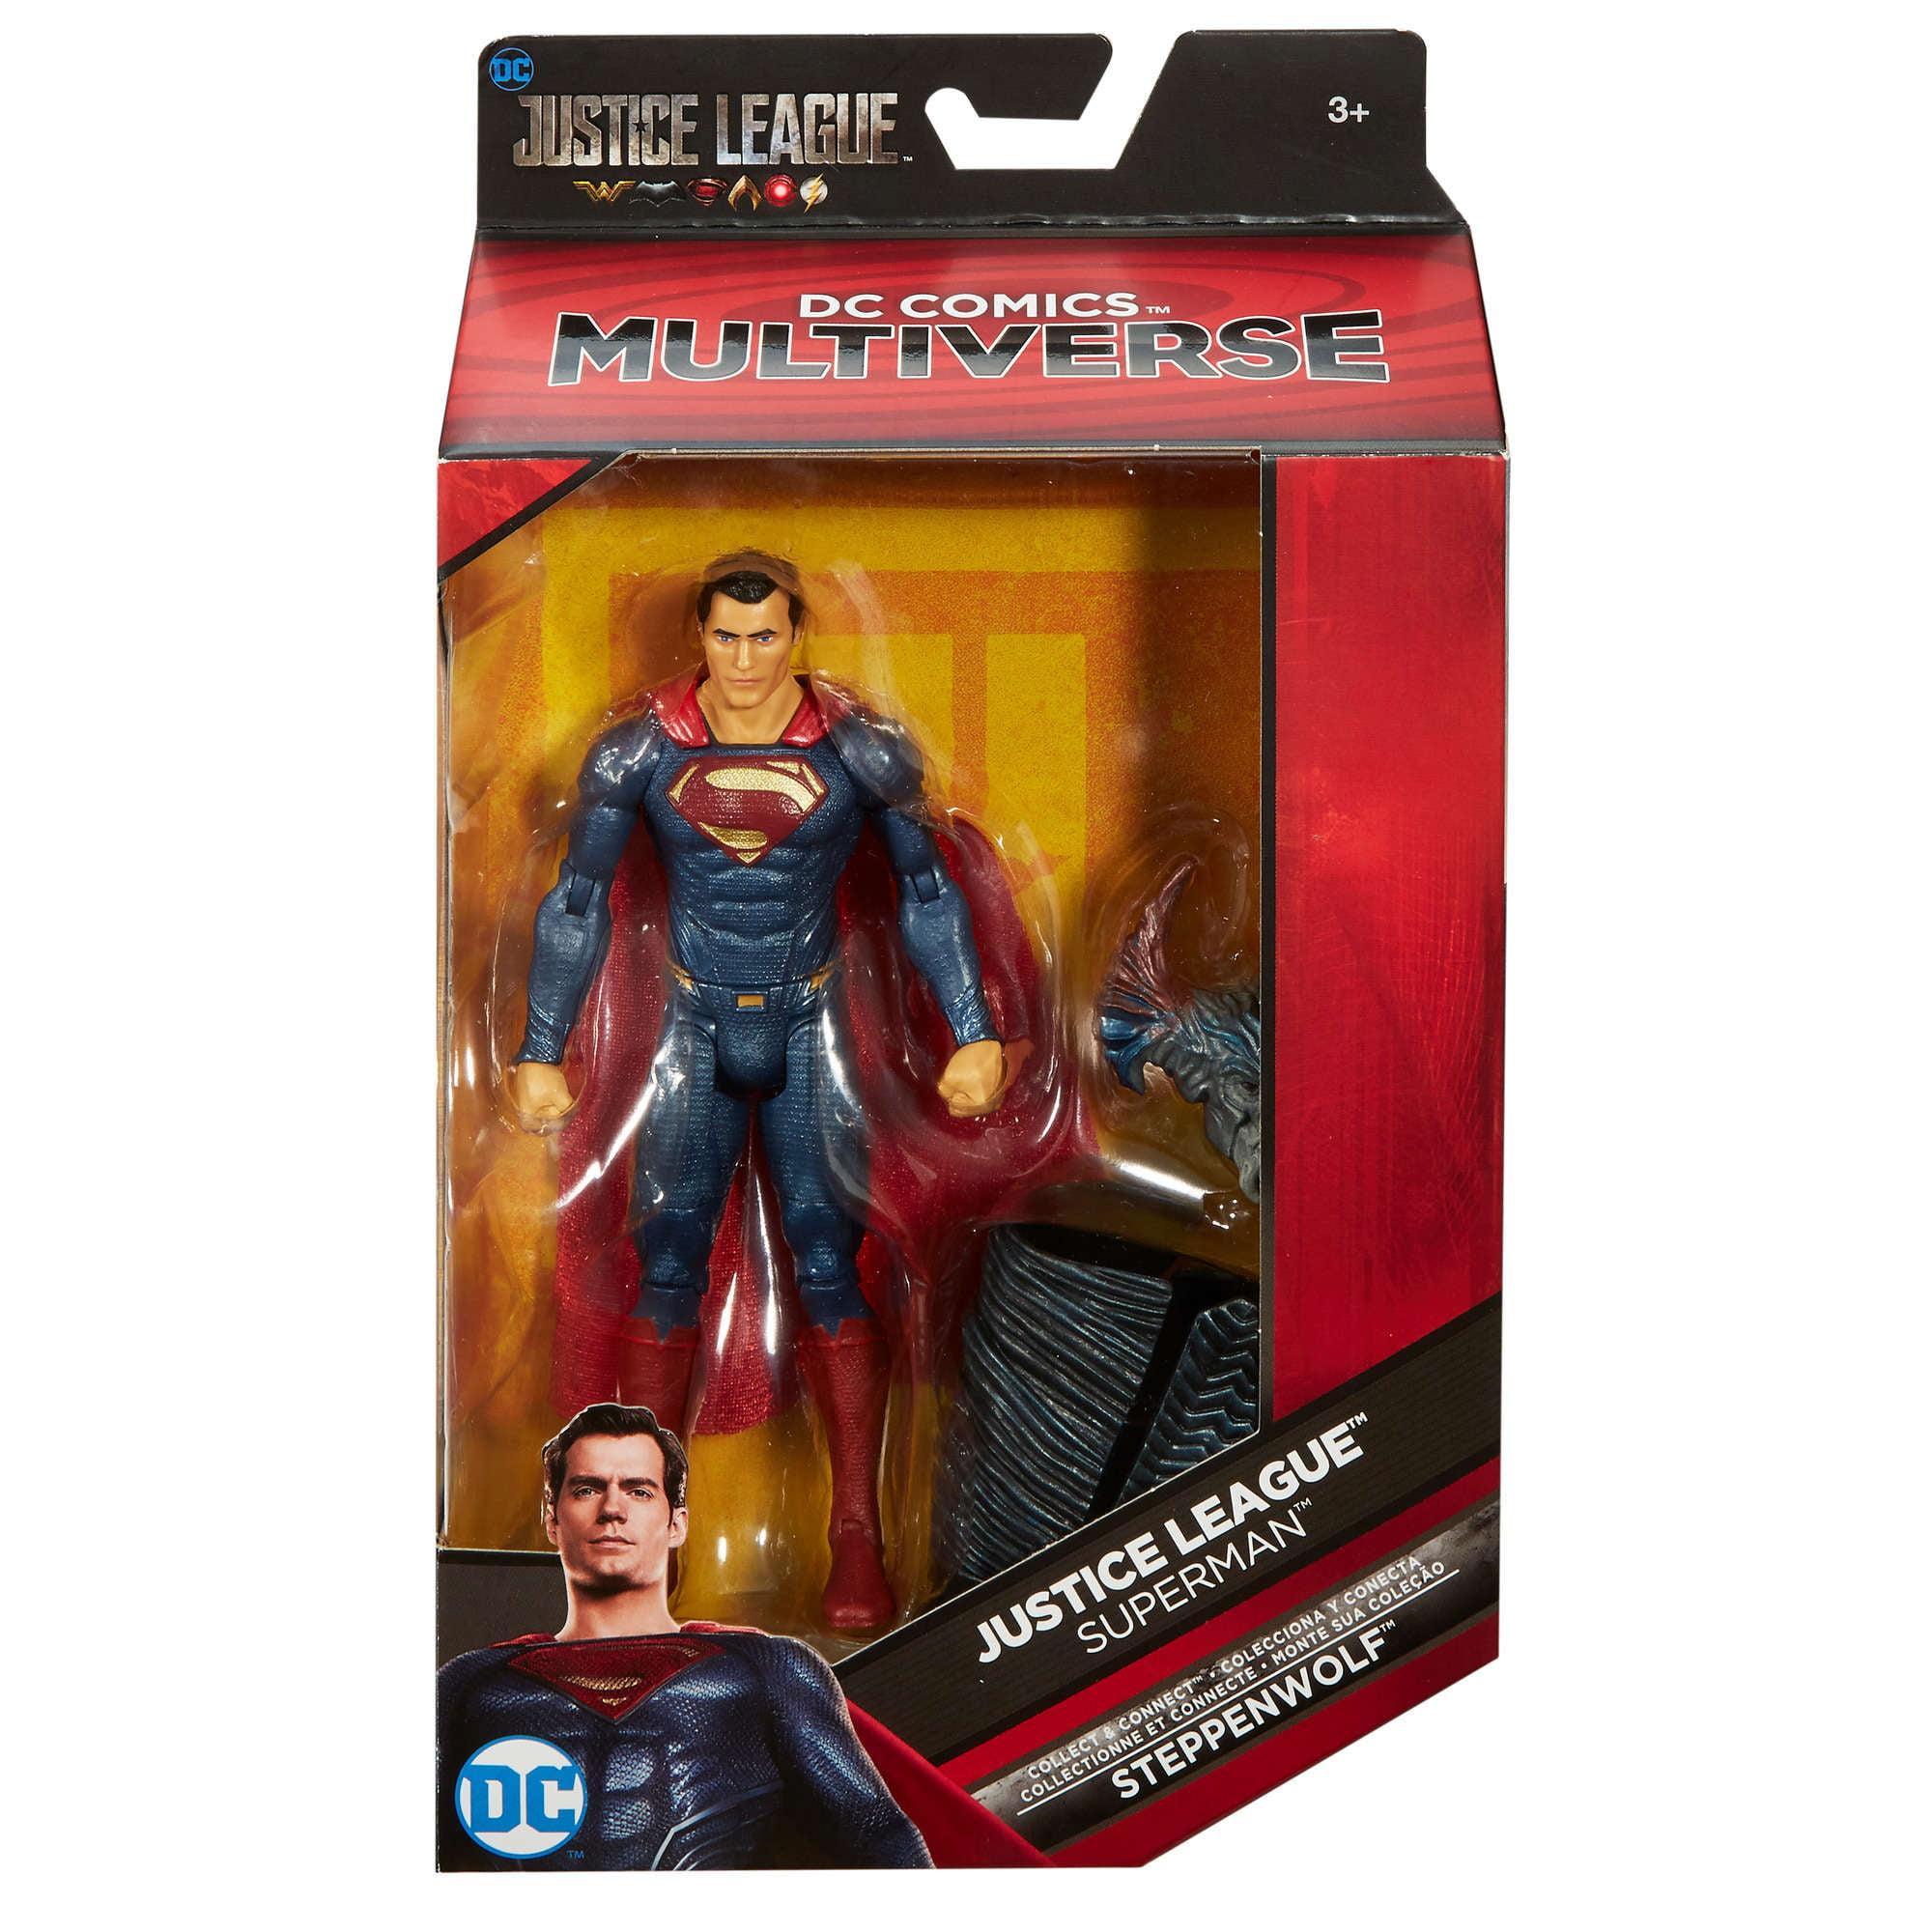 404802a9a4a4 DC Comics Multiverse Justice League Superman Action Figure - Walmart.com